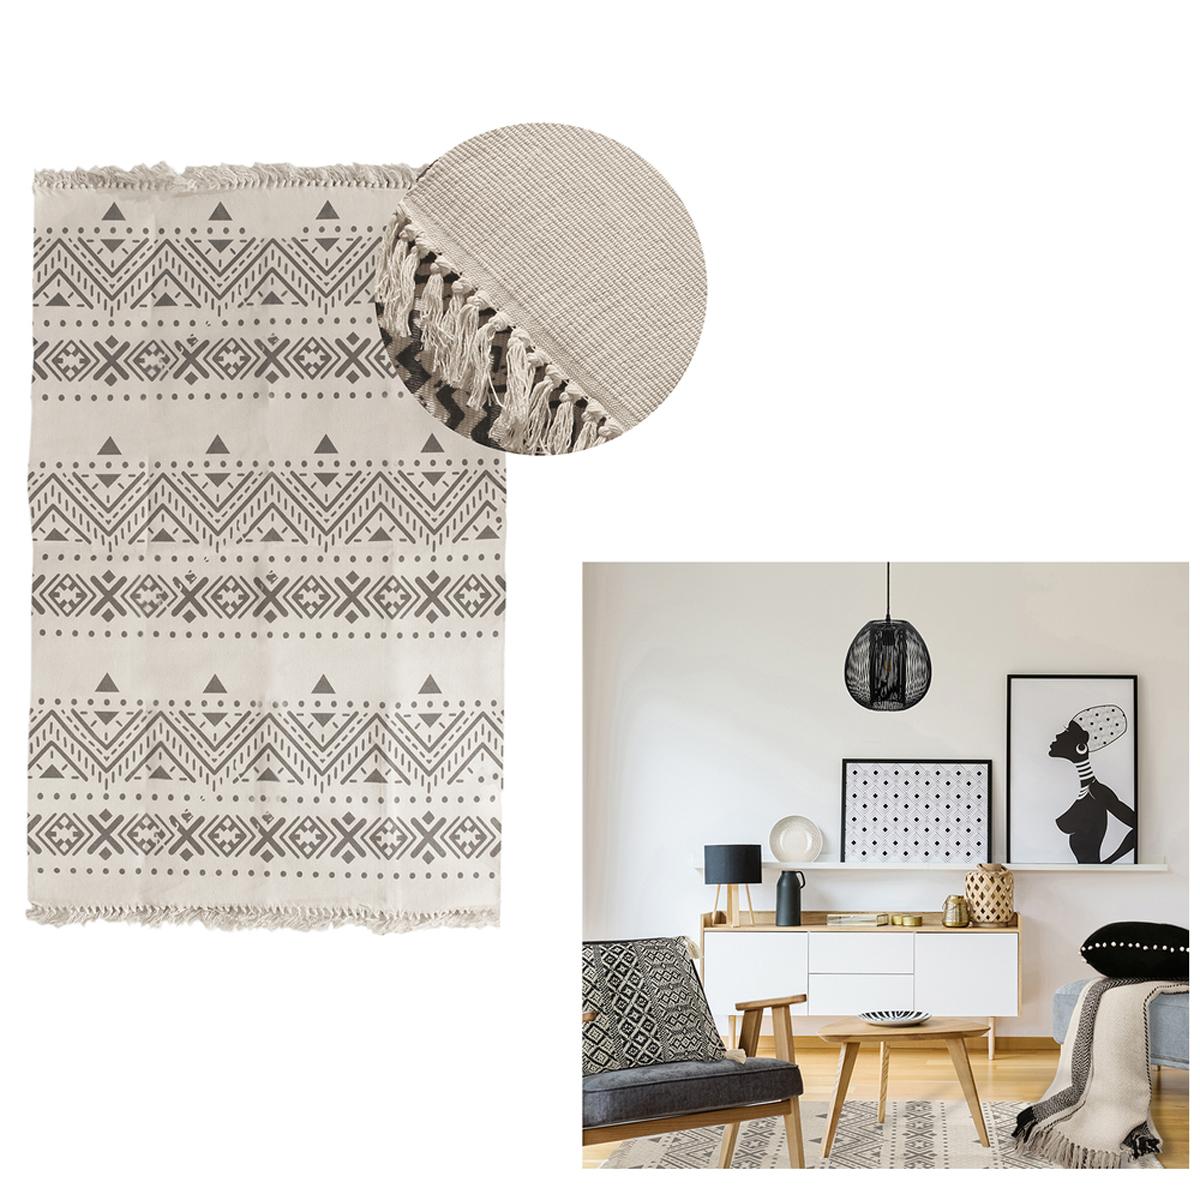 Tapis coton \'Boho\' écru gris - 200x140 cm - [R0047]